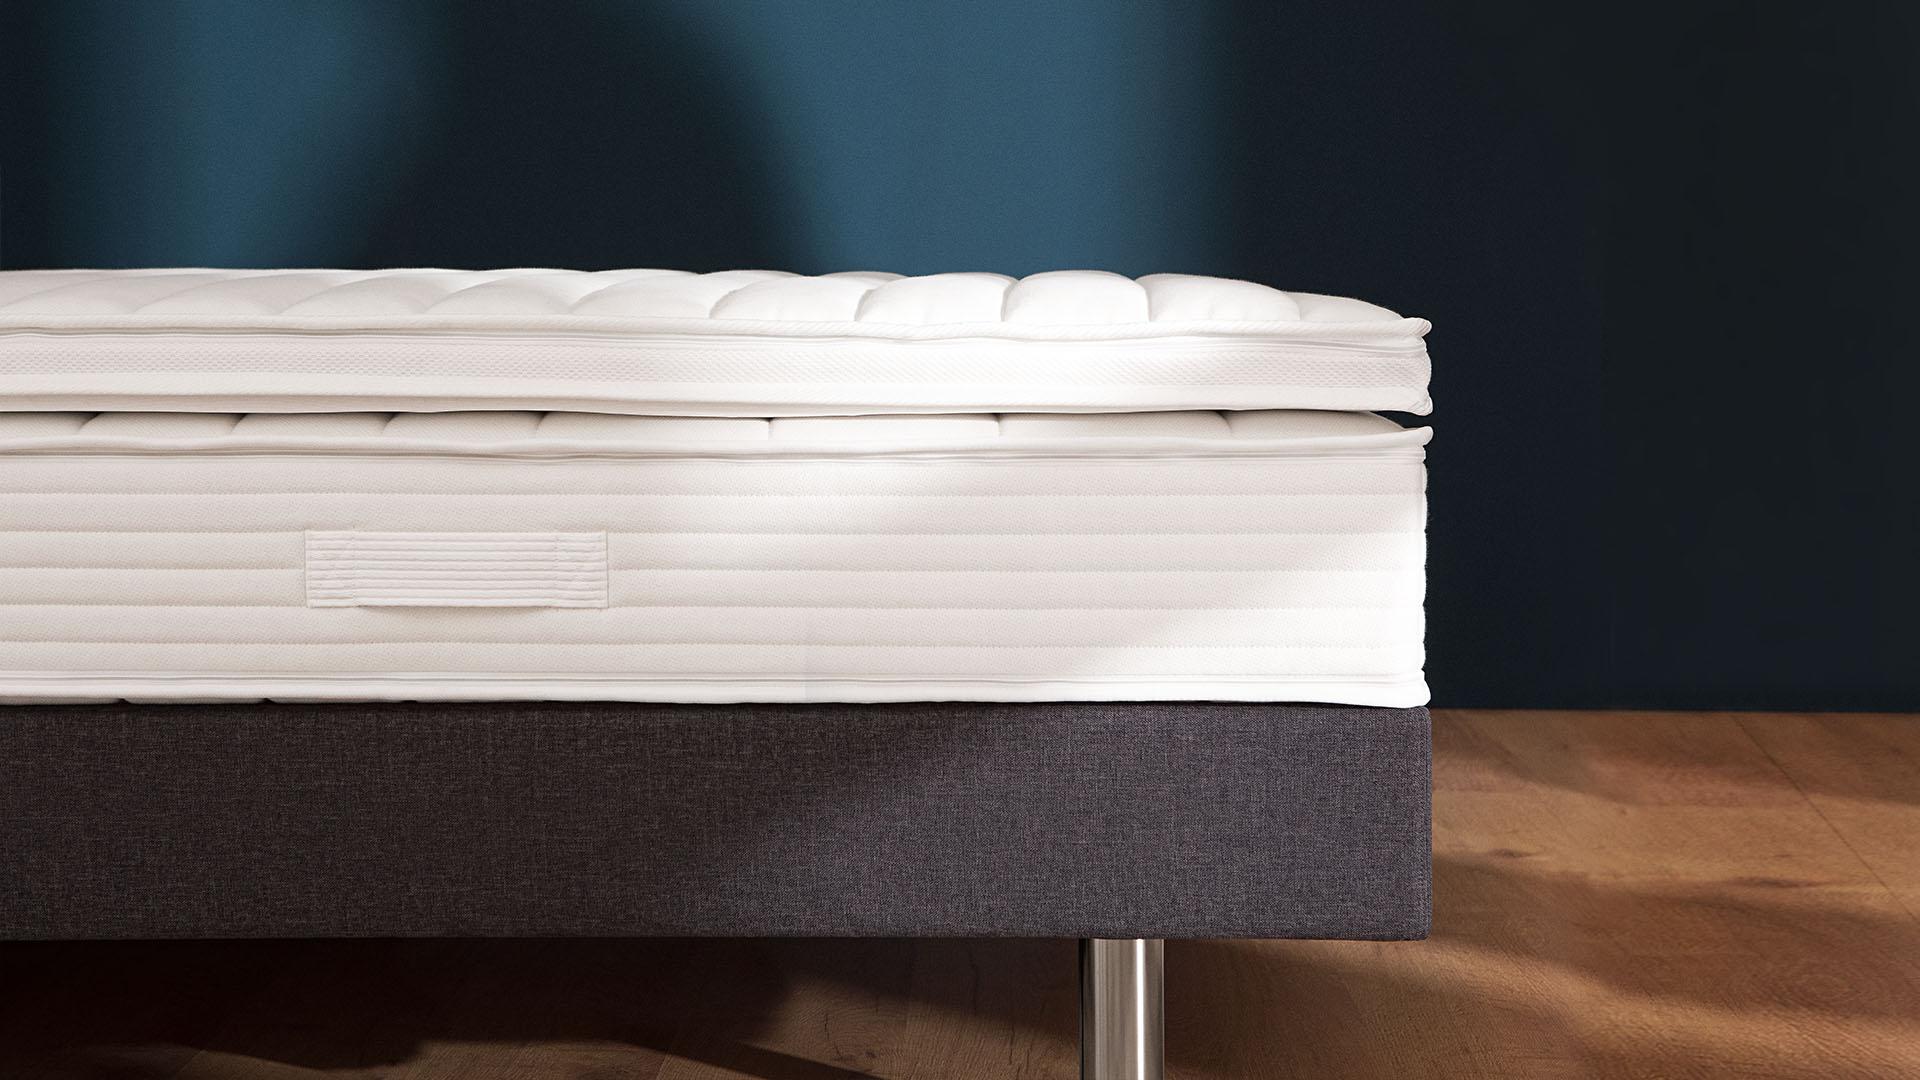 Röwa Betten Bettsysteme Matratzen Und Lattenroste